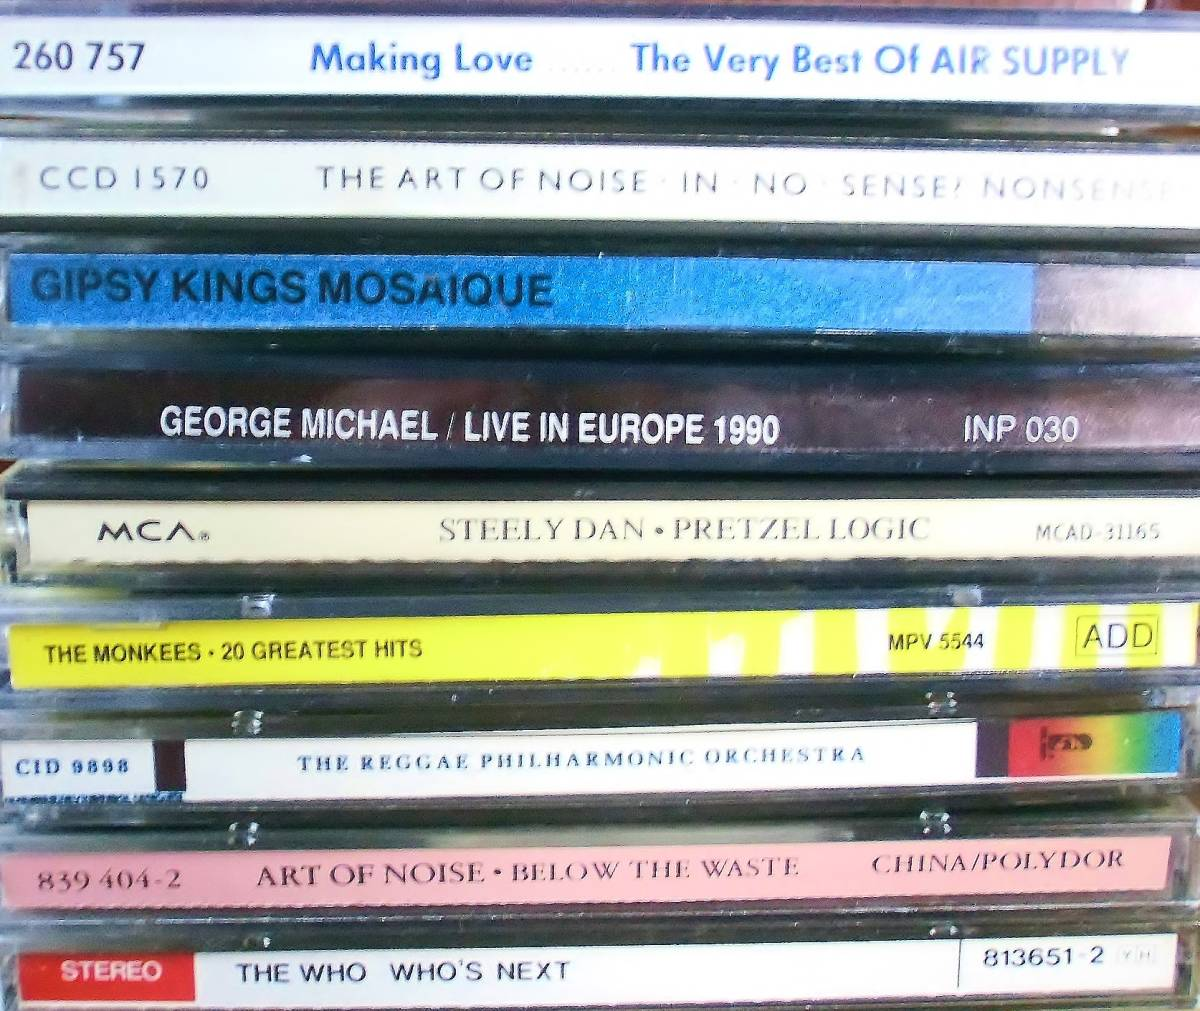 70s 80s Rock、Pops中心 CD109枚 セット タイトル詳細有 大量 AORなど_画像4